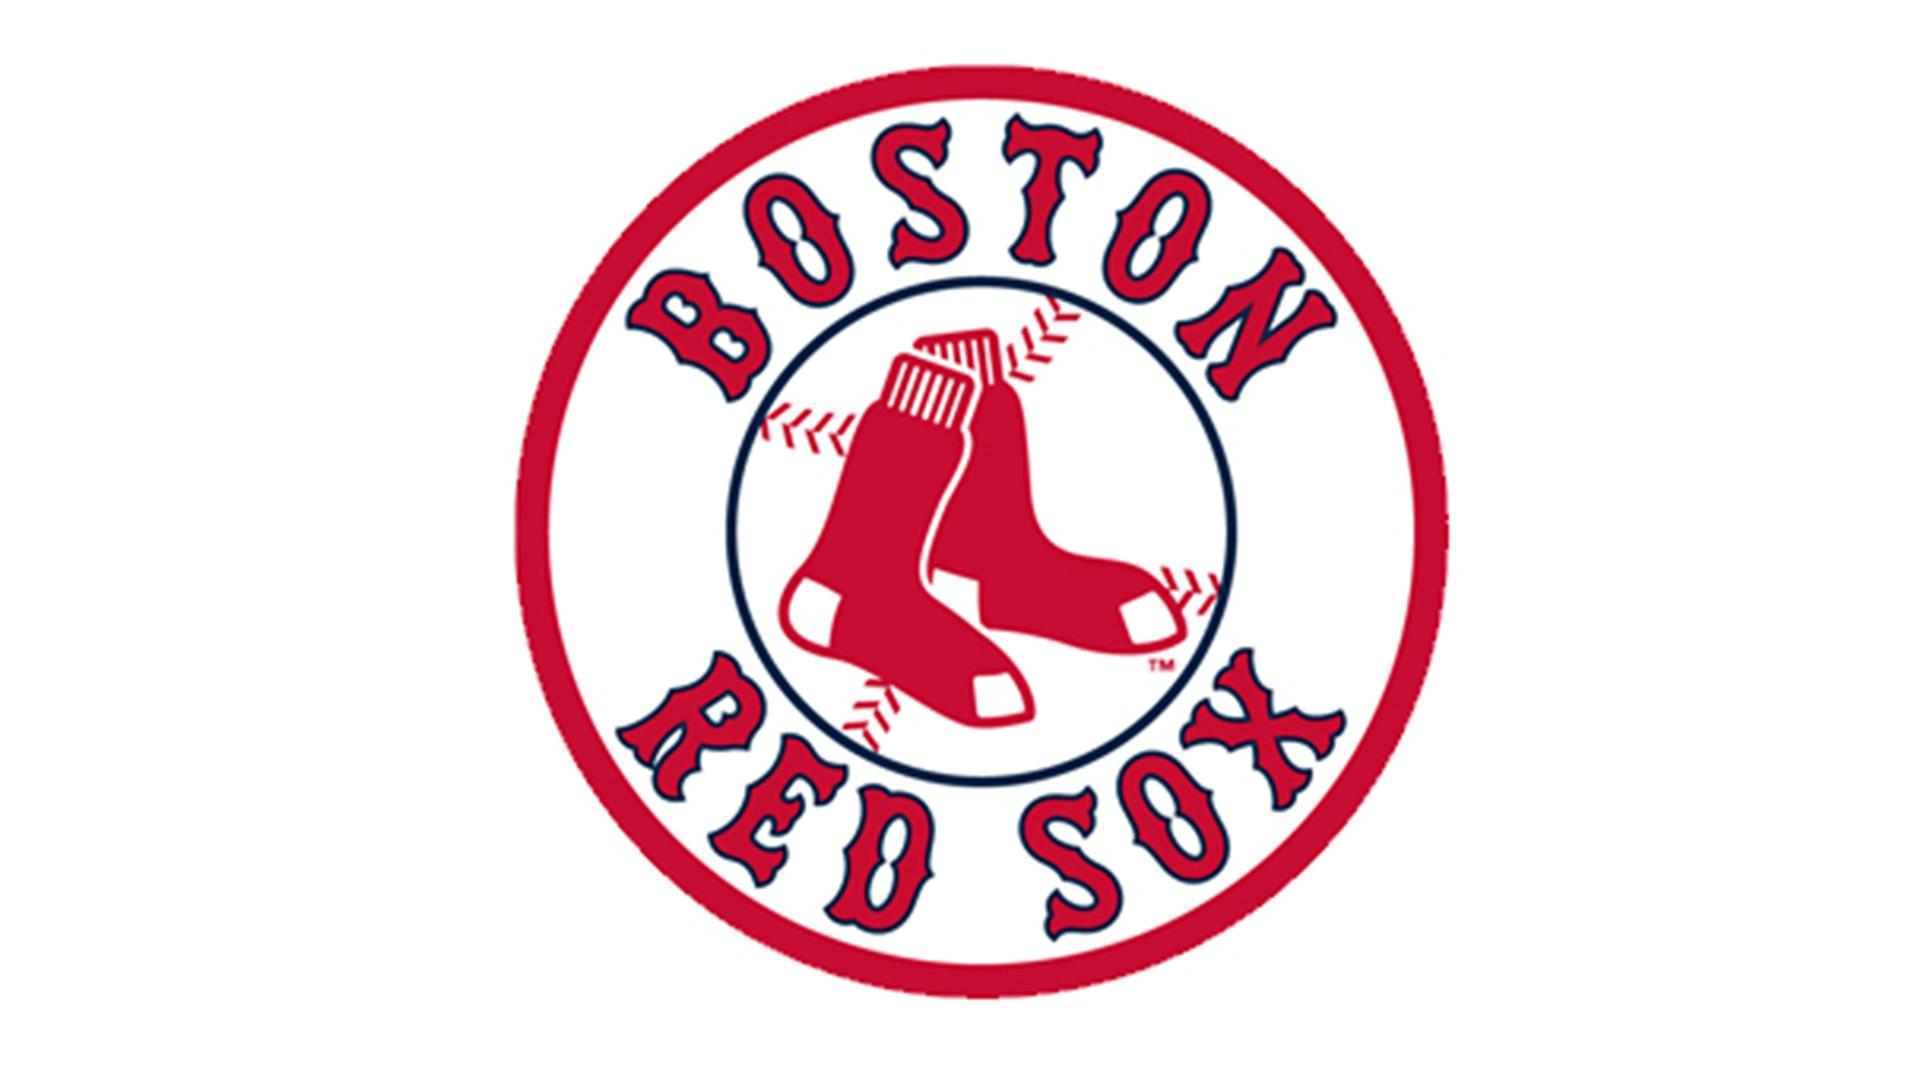 Boston Redsox Red Sox Logo Wallpaper #2542 – Resolution 1366×768 px | Red  Sox Wallpaper | Pinterest | Red socks